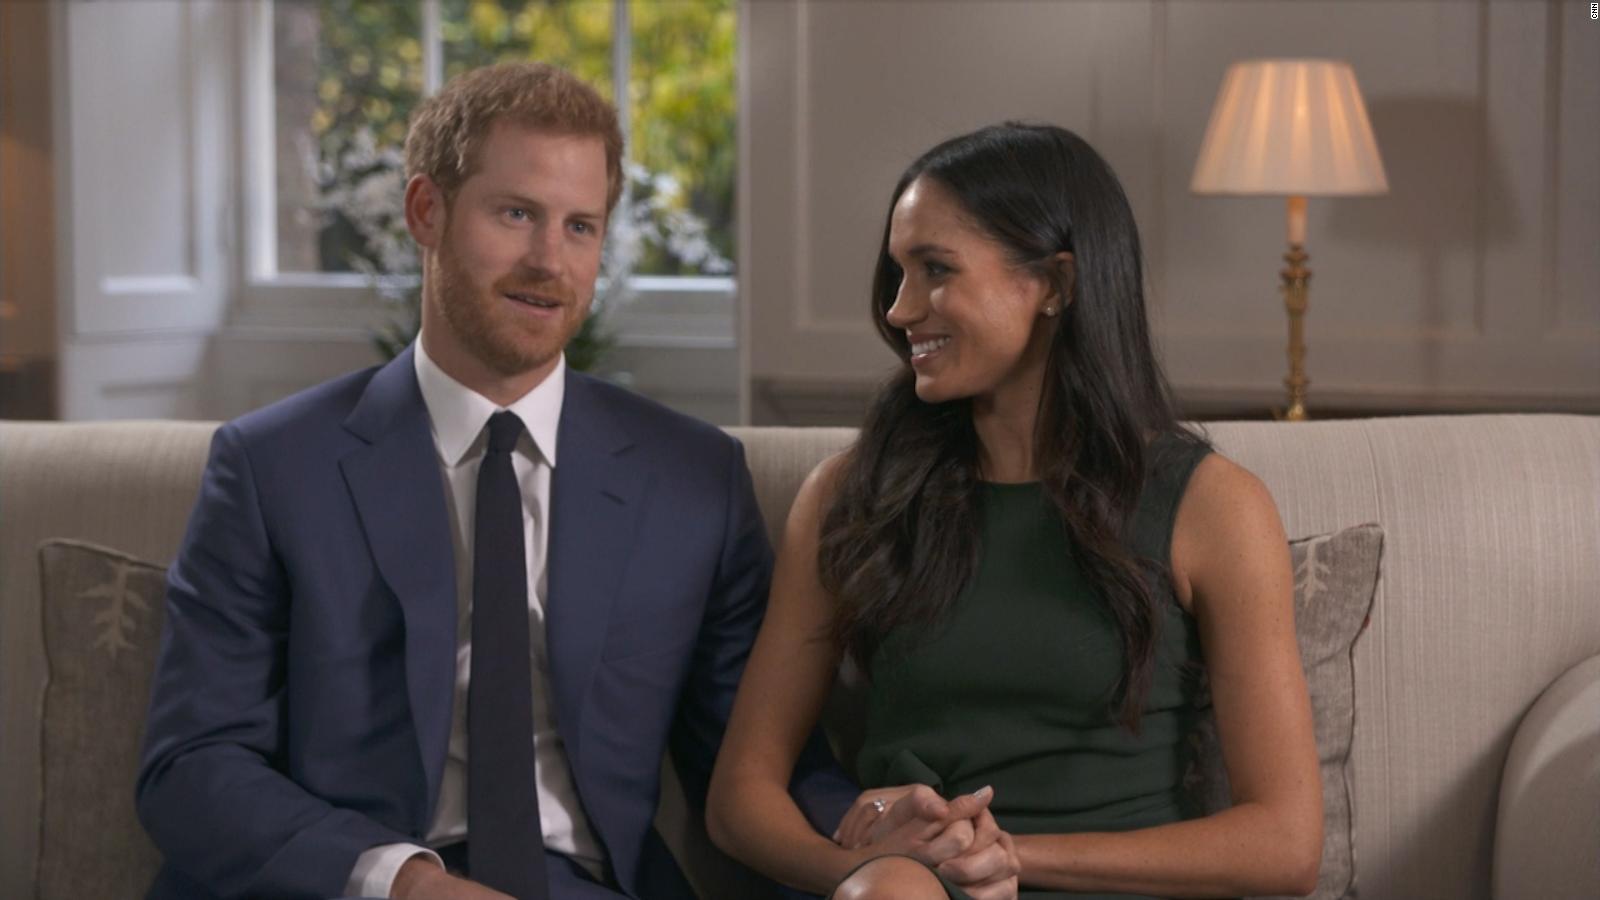 171127131842-royal-couple-1-full-169